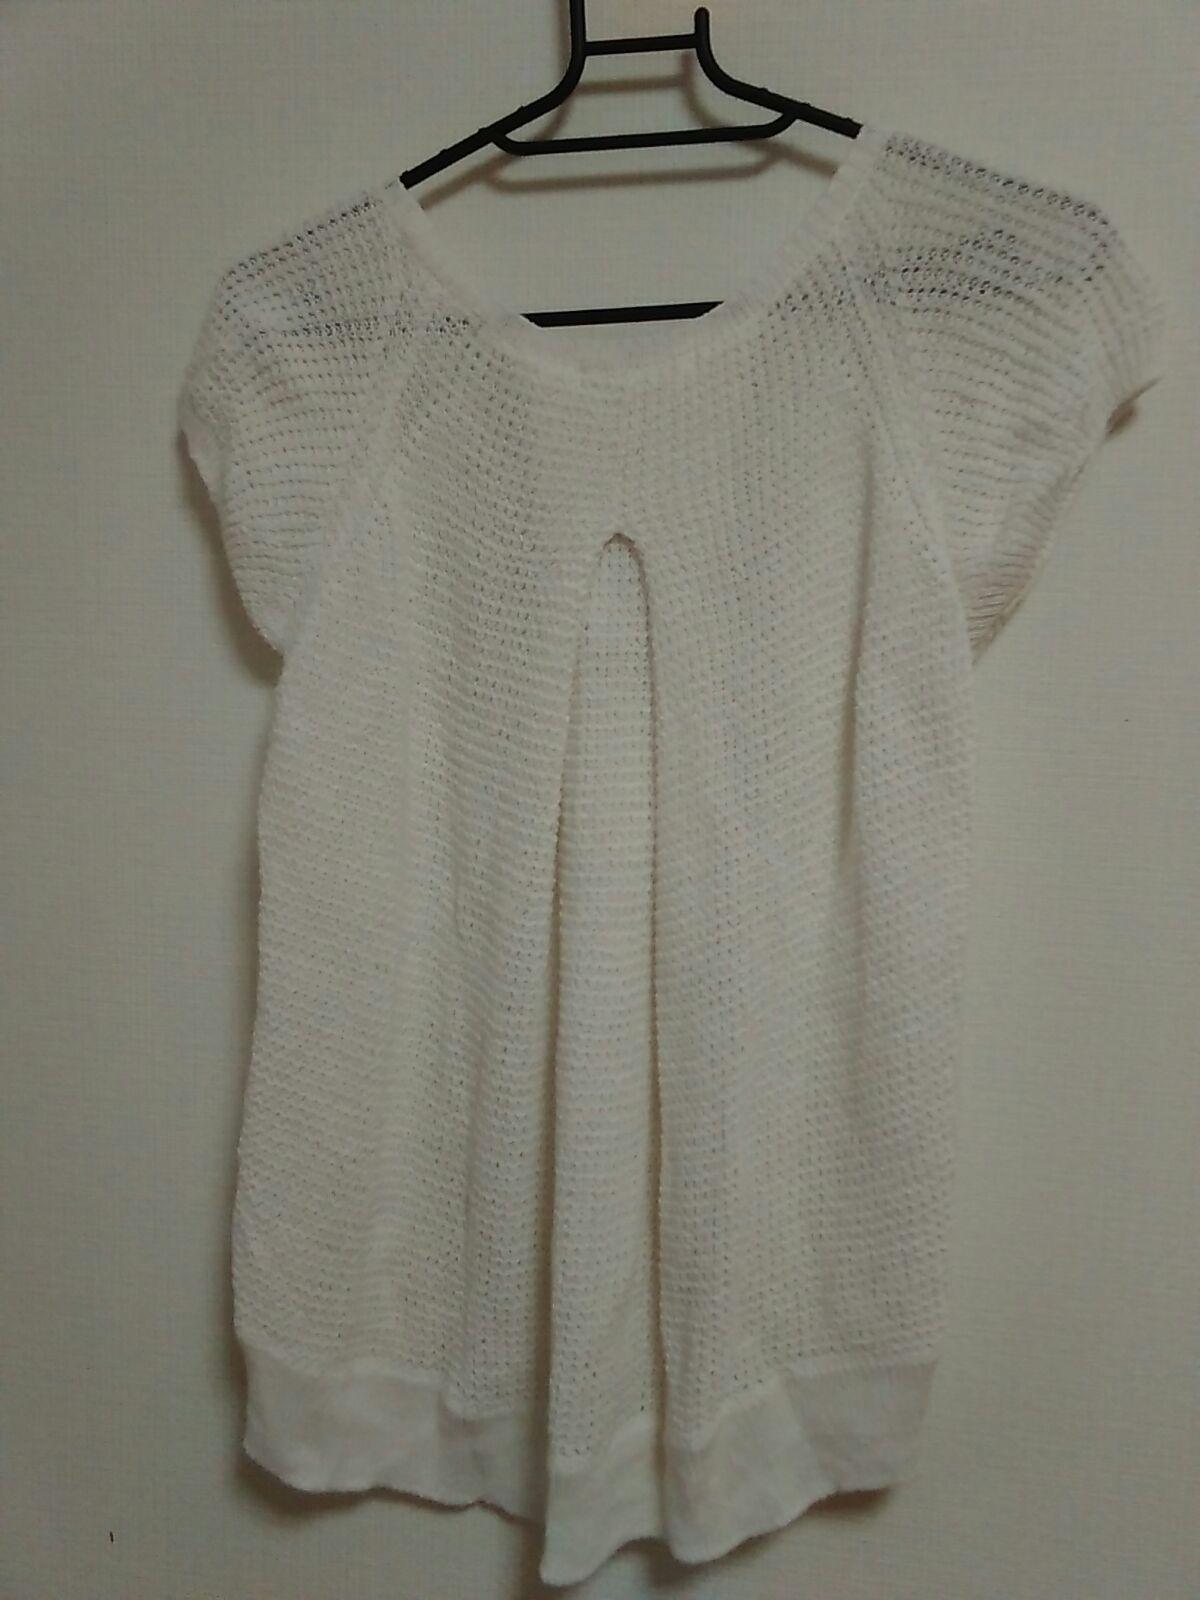 URBAN RESEARCH(アーバンリサーチ)のセーター